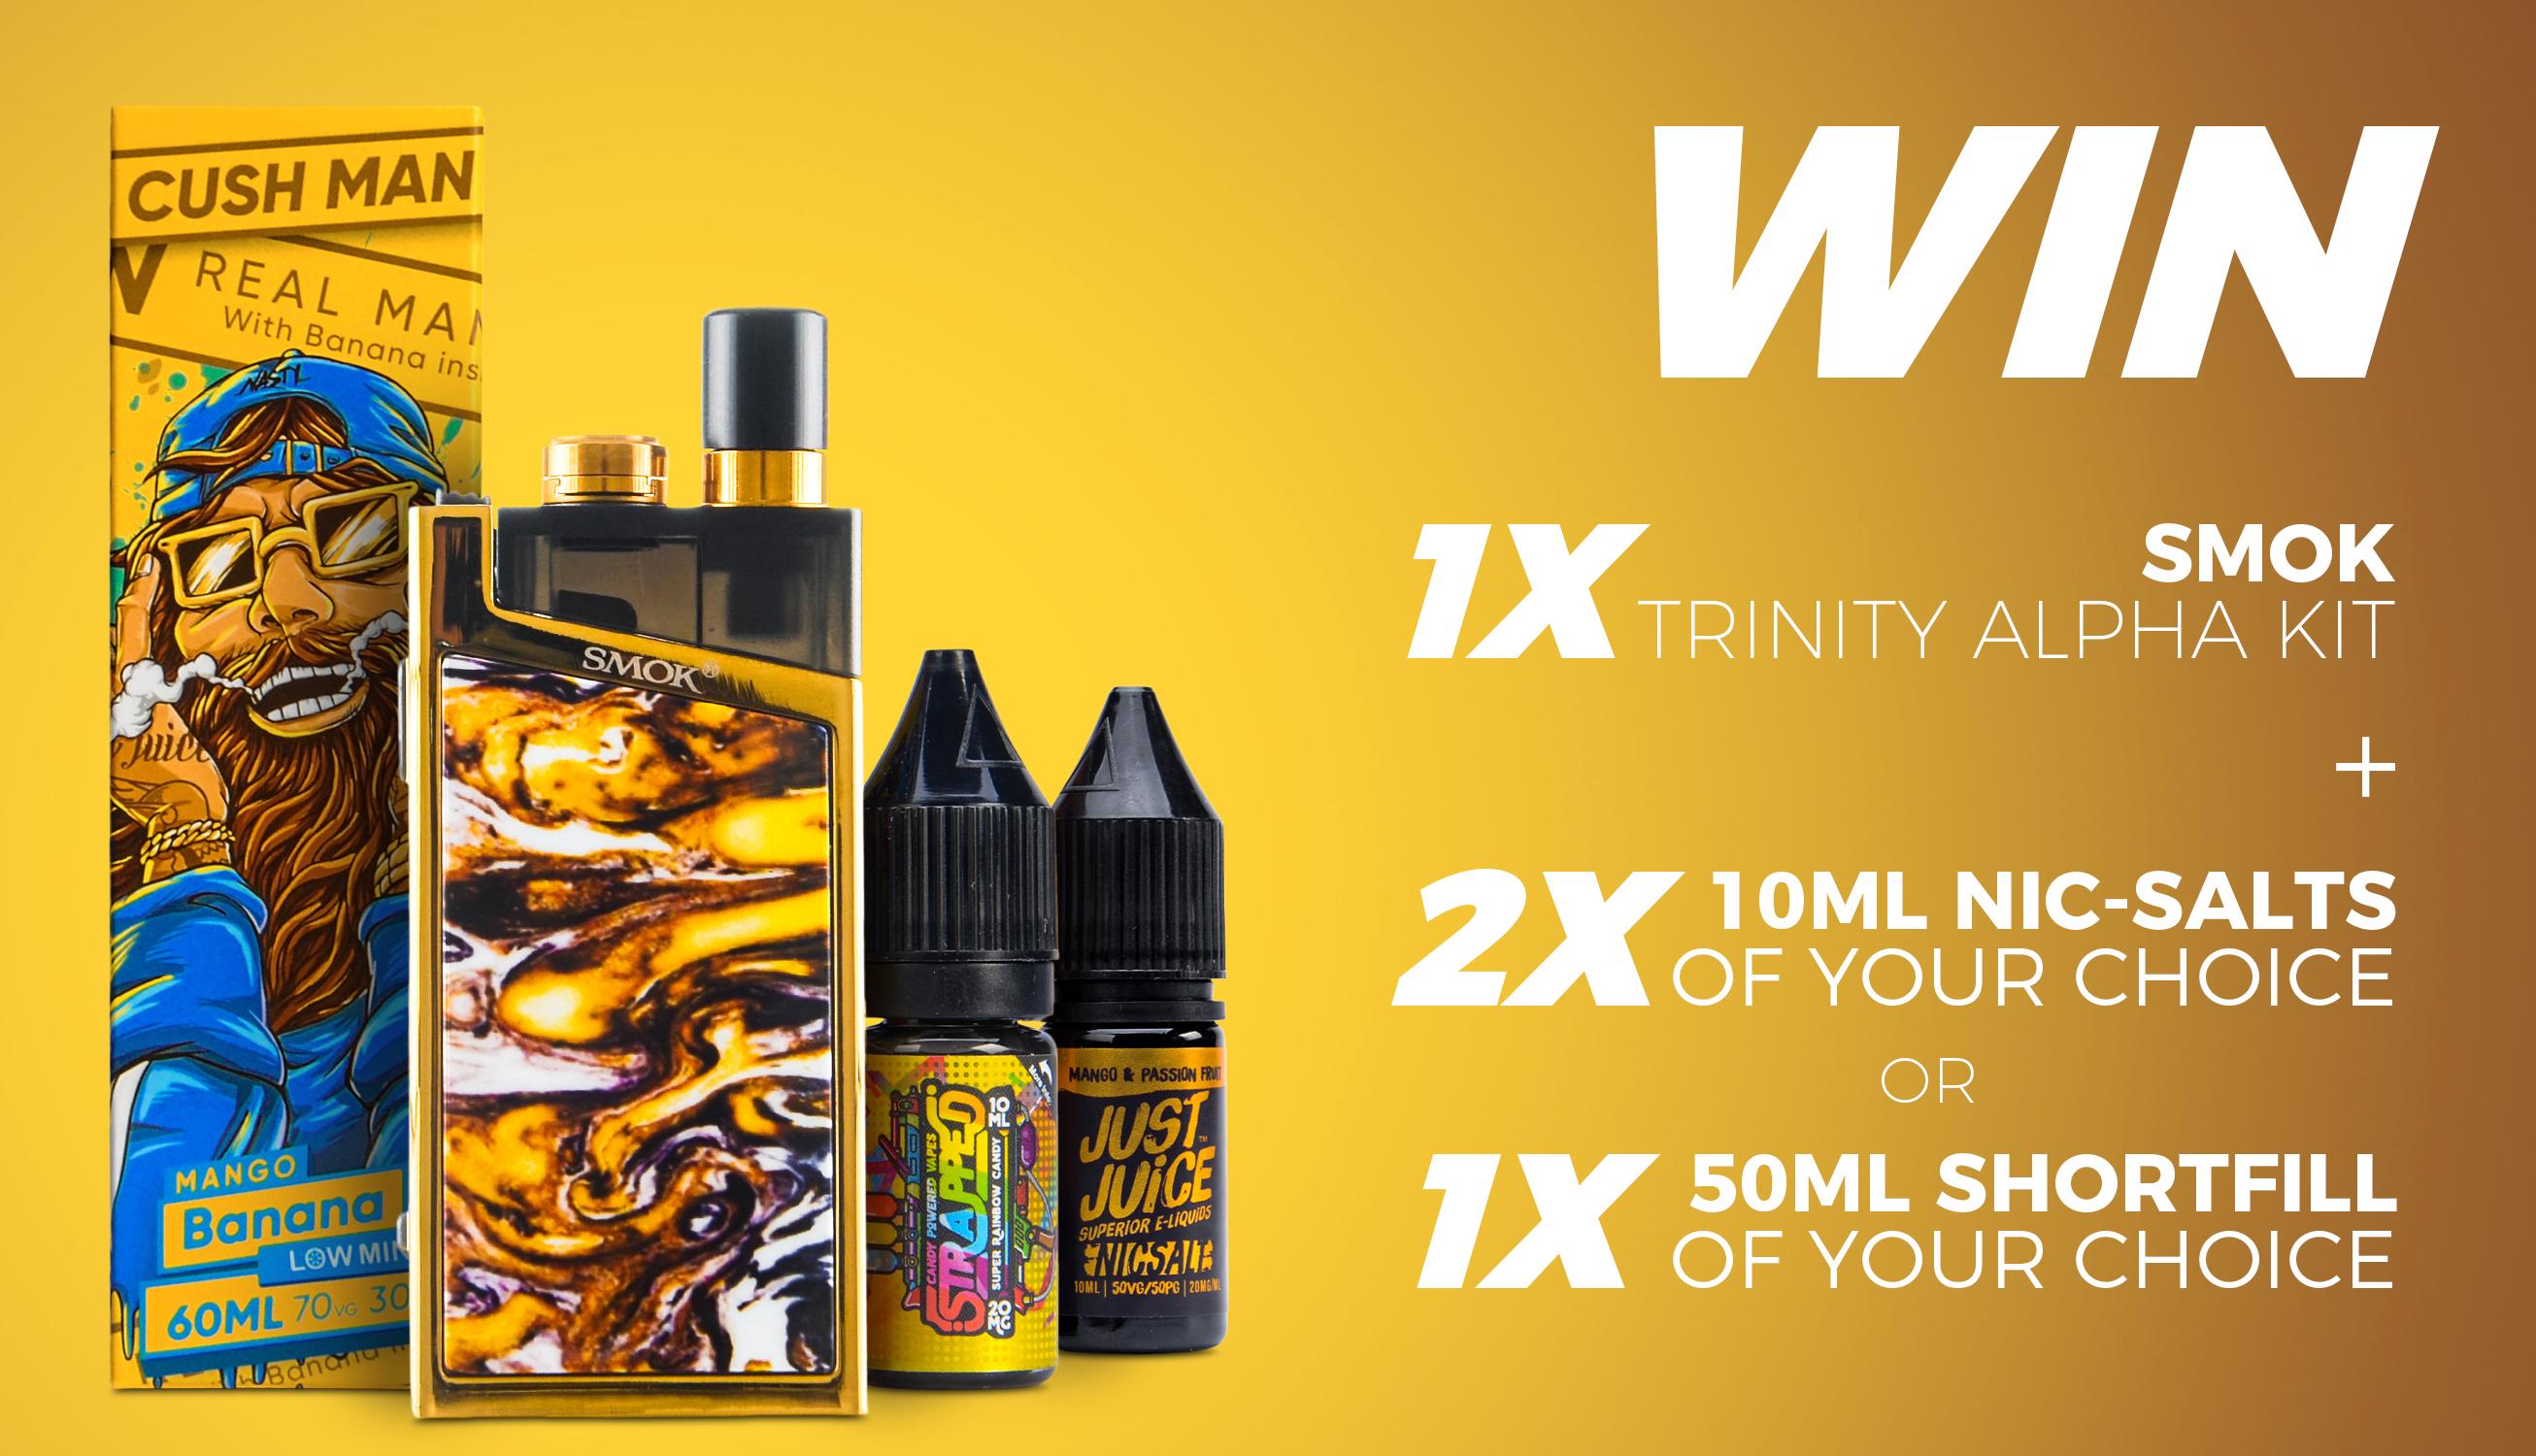 Win a Smok Trinity Alpha Pod Kit plus E-liquids